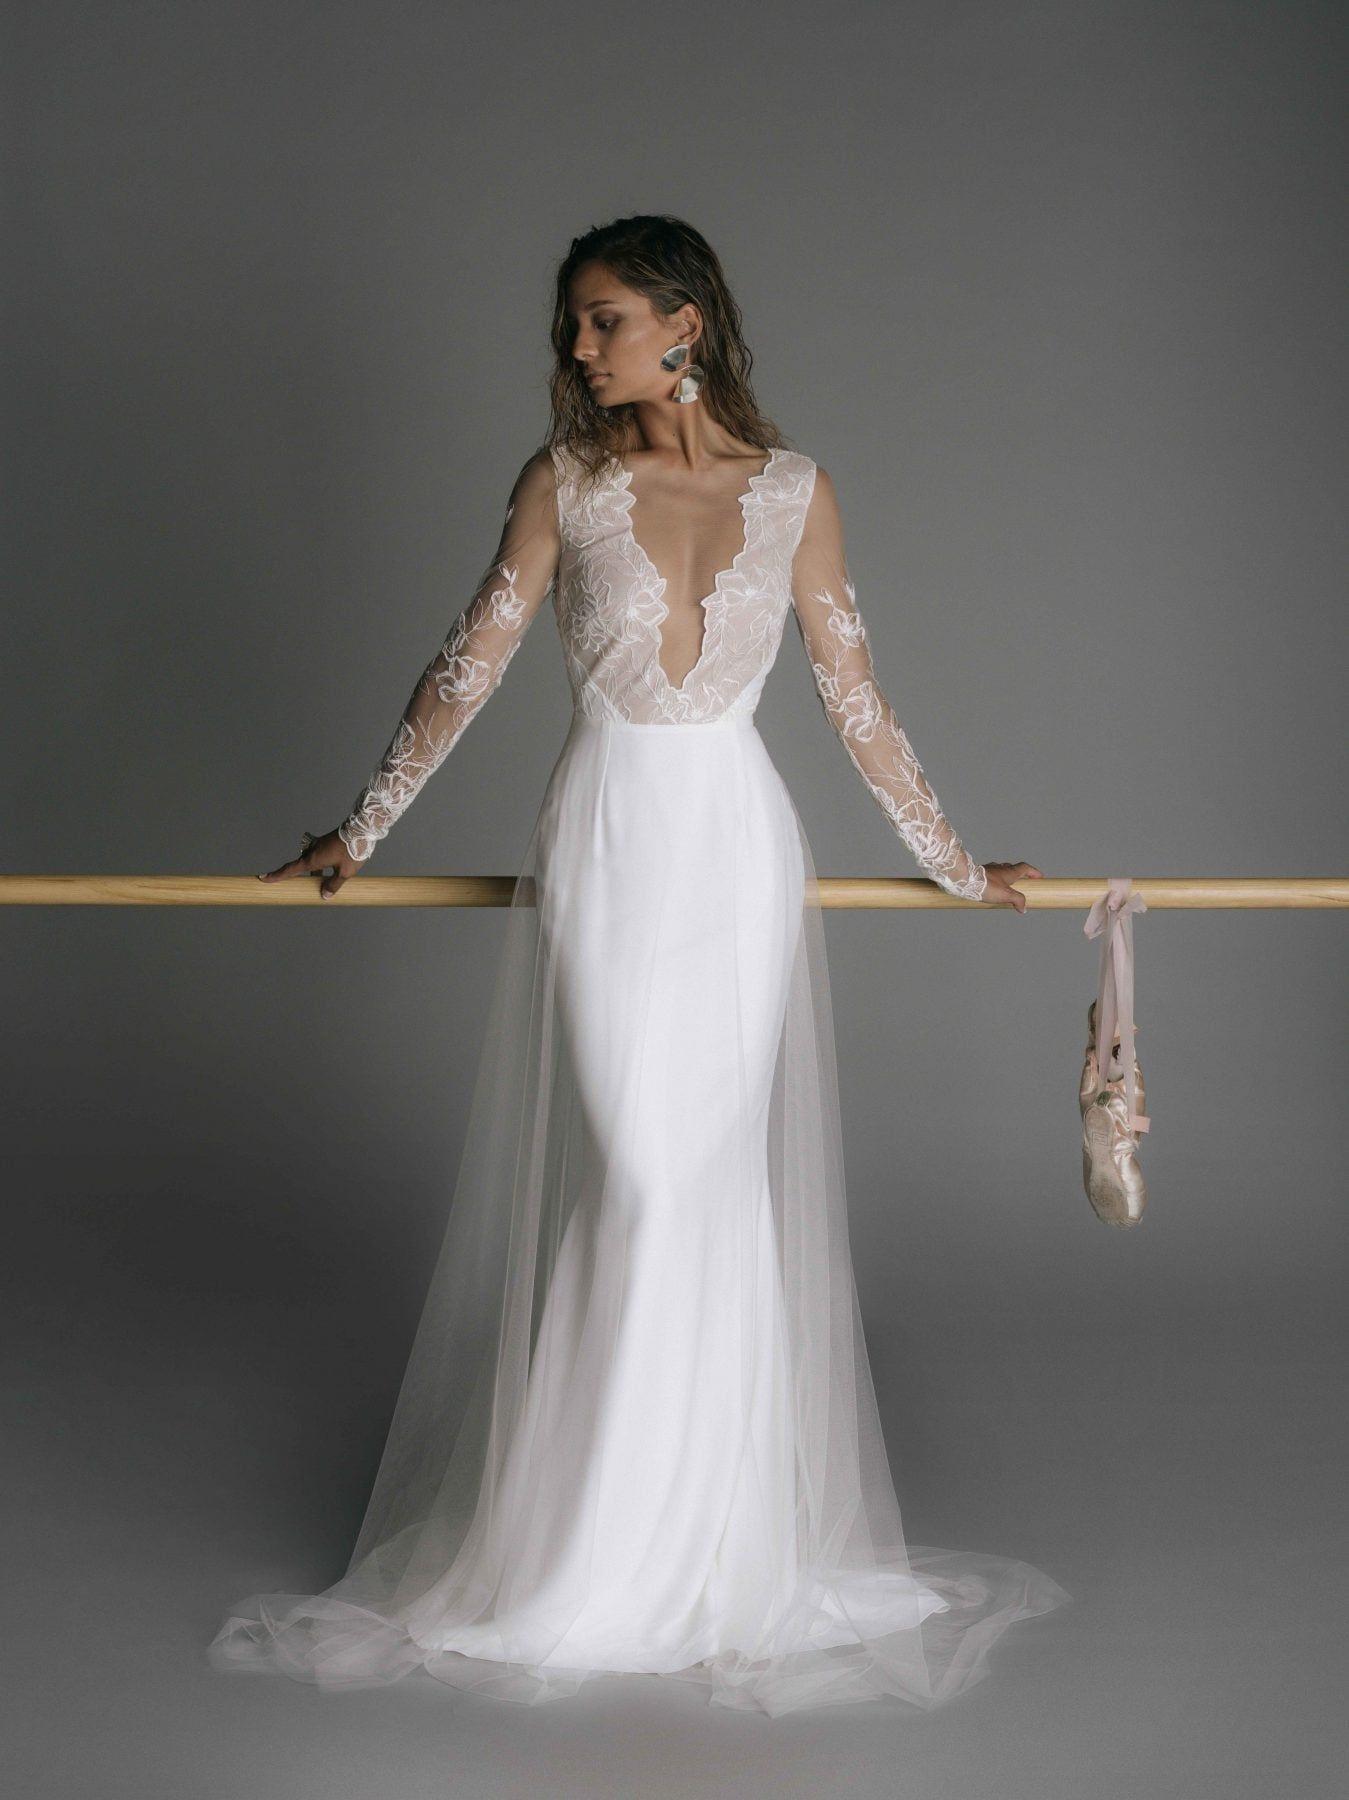 6450ed6d65e8a Robe de mariée Ailey, Rime Arodaky Rime Arodaky, Bridal Dresses, Designer Wedding  Dresses